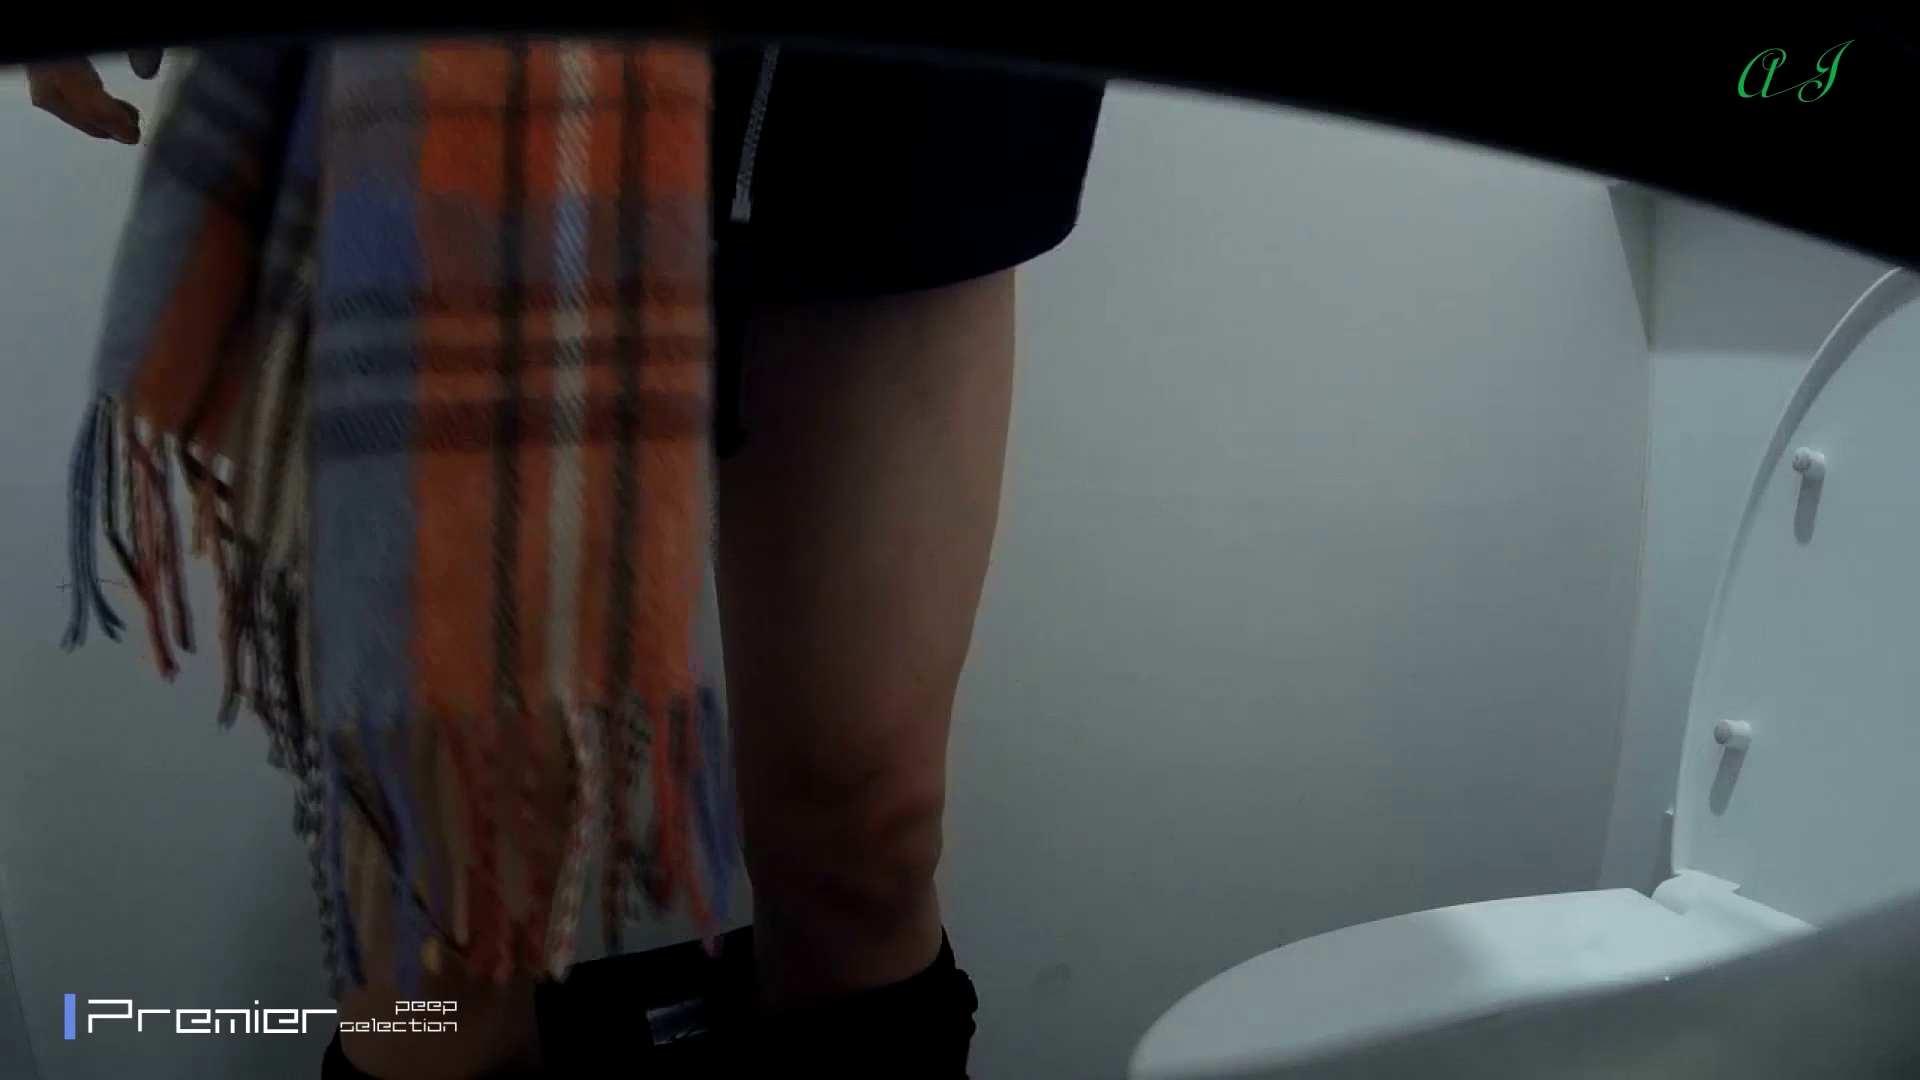 大あり美JDトイレ盗撮【有名大学女性洗面所 vol.80】 高画質  113PIX 112